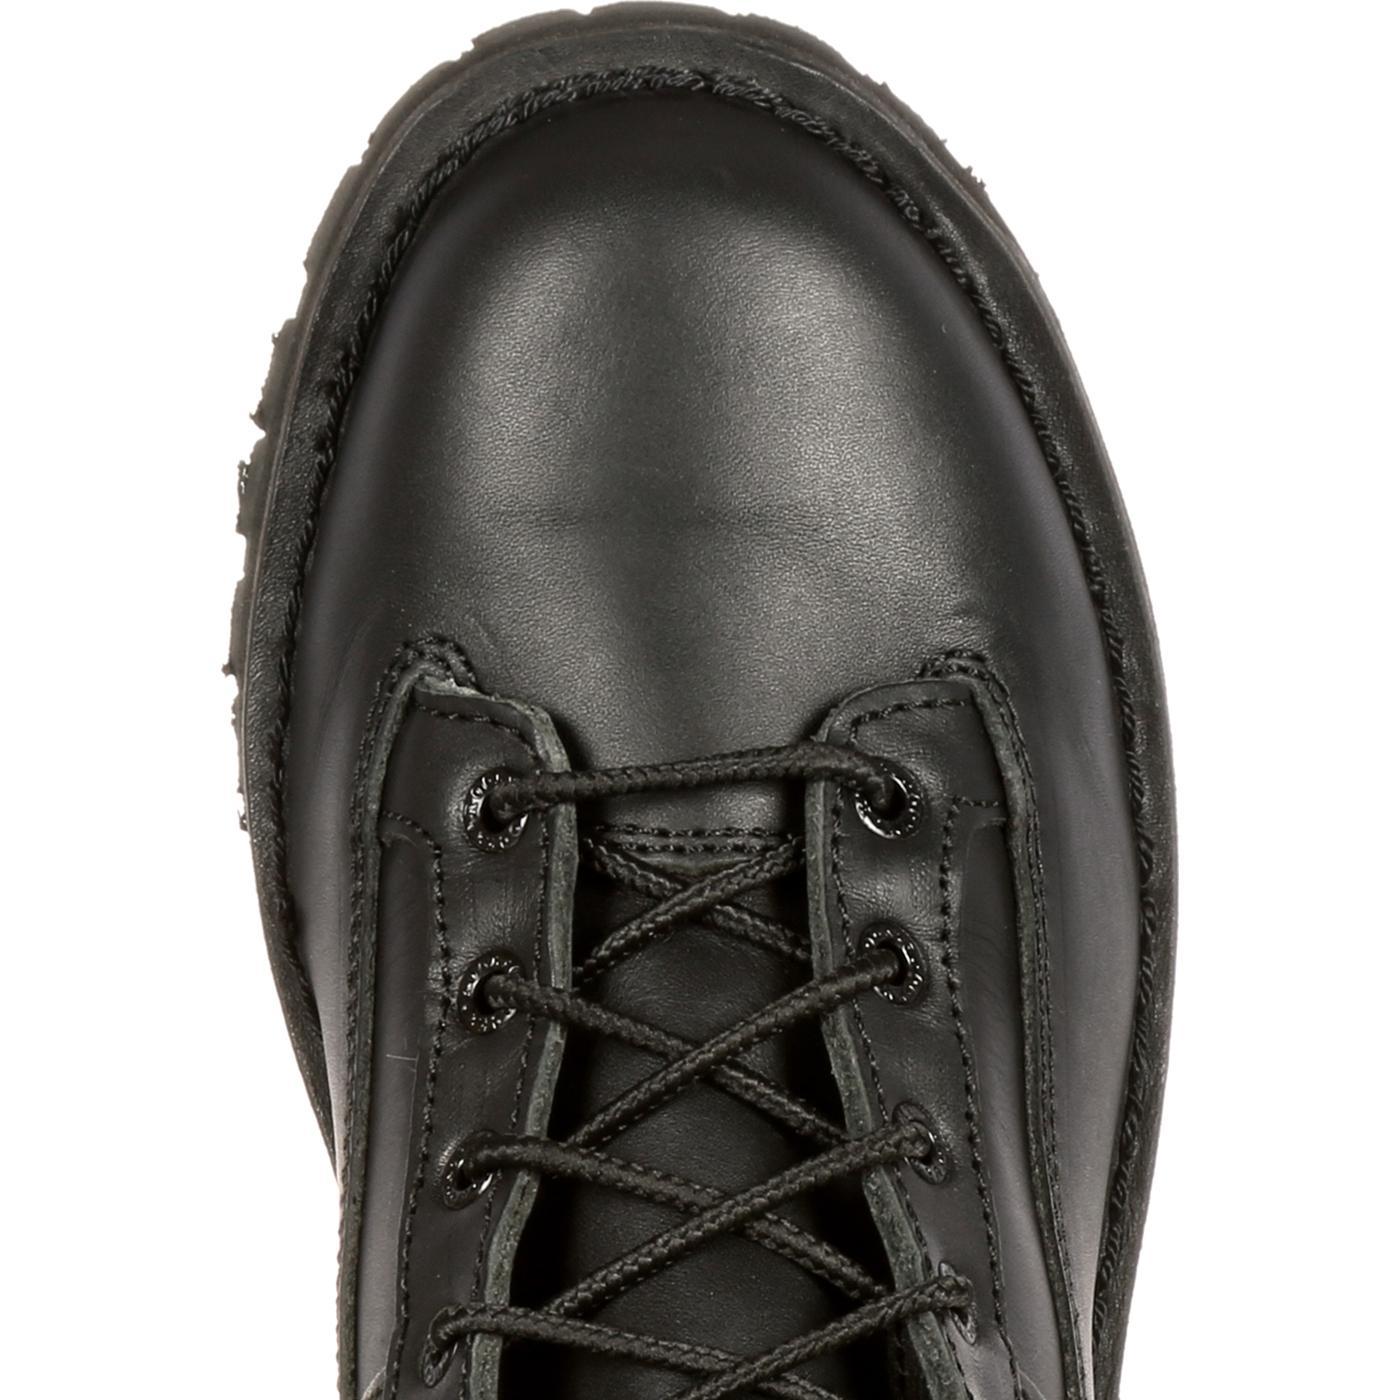 af9ca335900 Rocky Portland Lace-to-Toe Waterproof Duty Boots